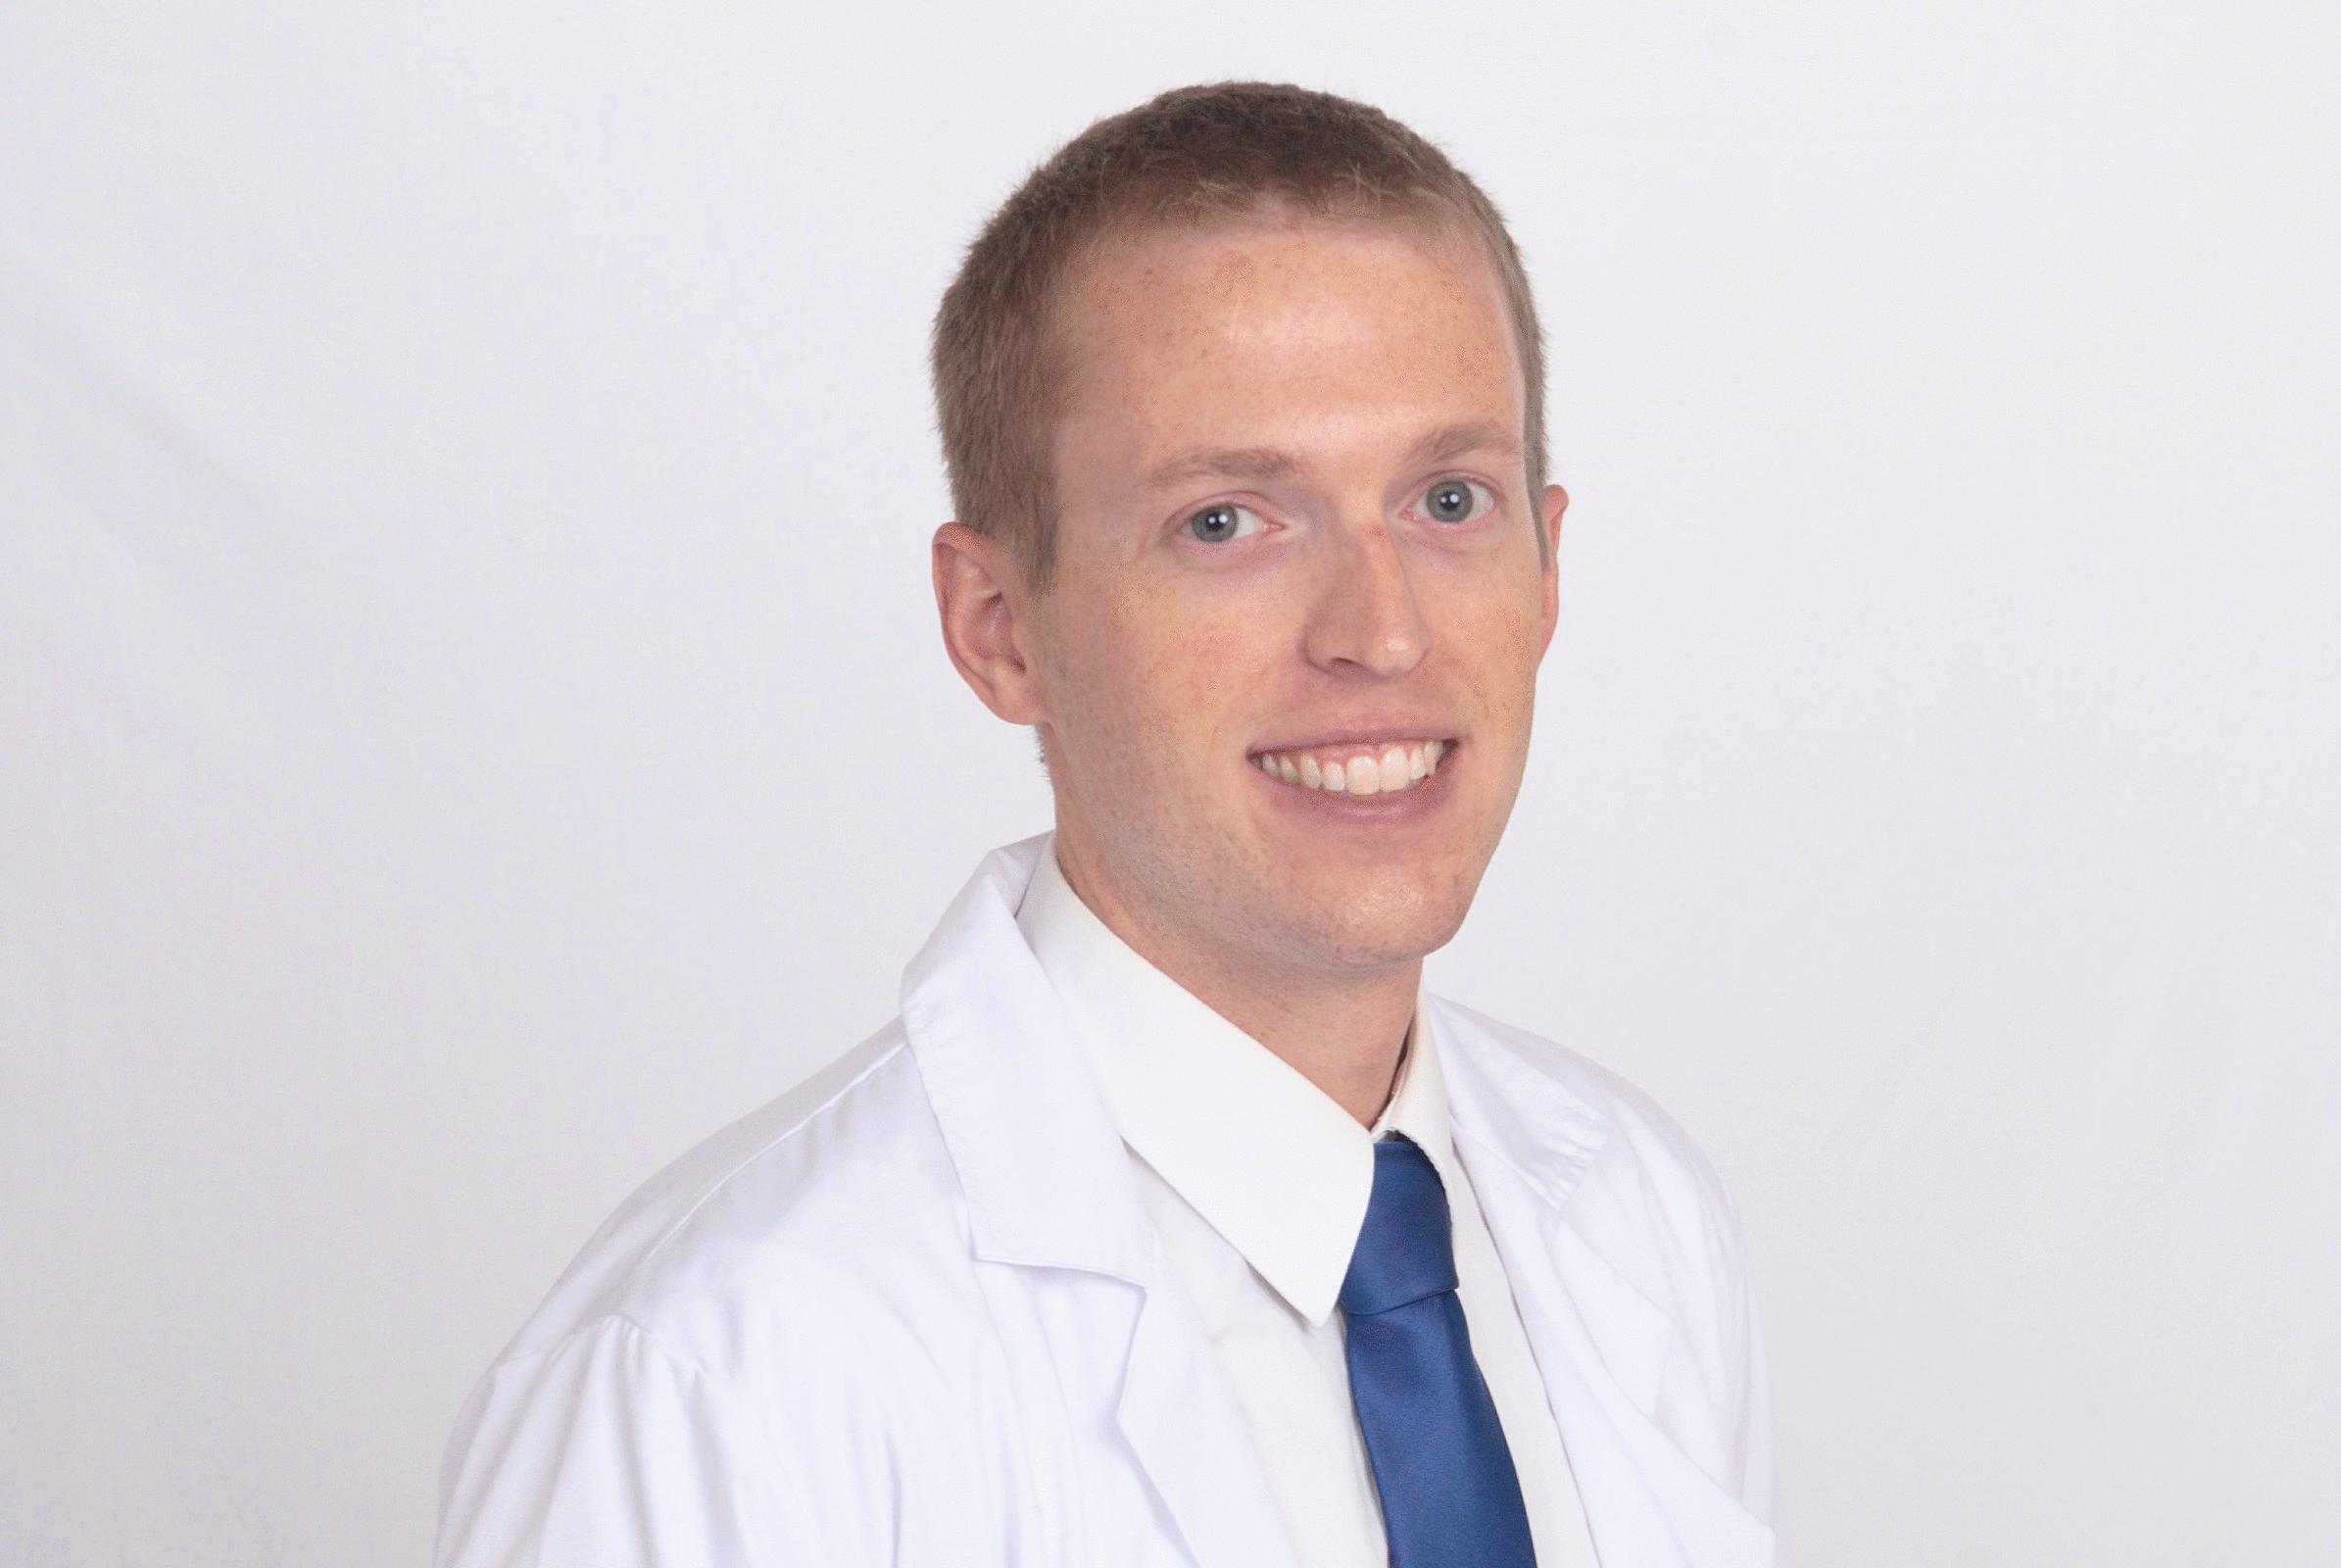 Des Moines LASIK & PRK Laser Eye Surgery - LasikPlus image 1